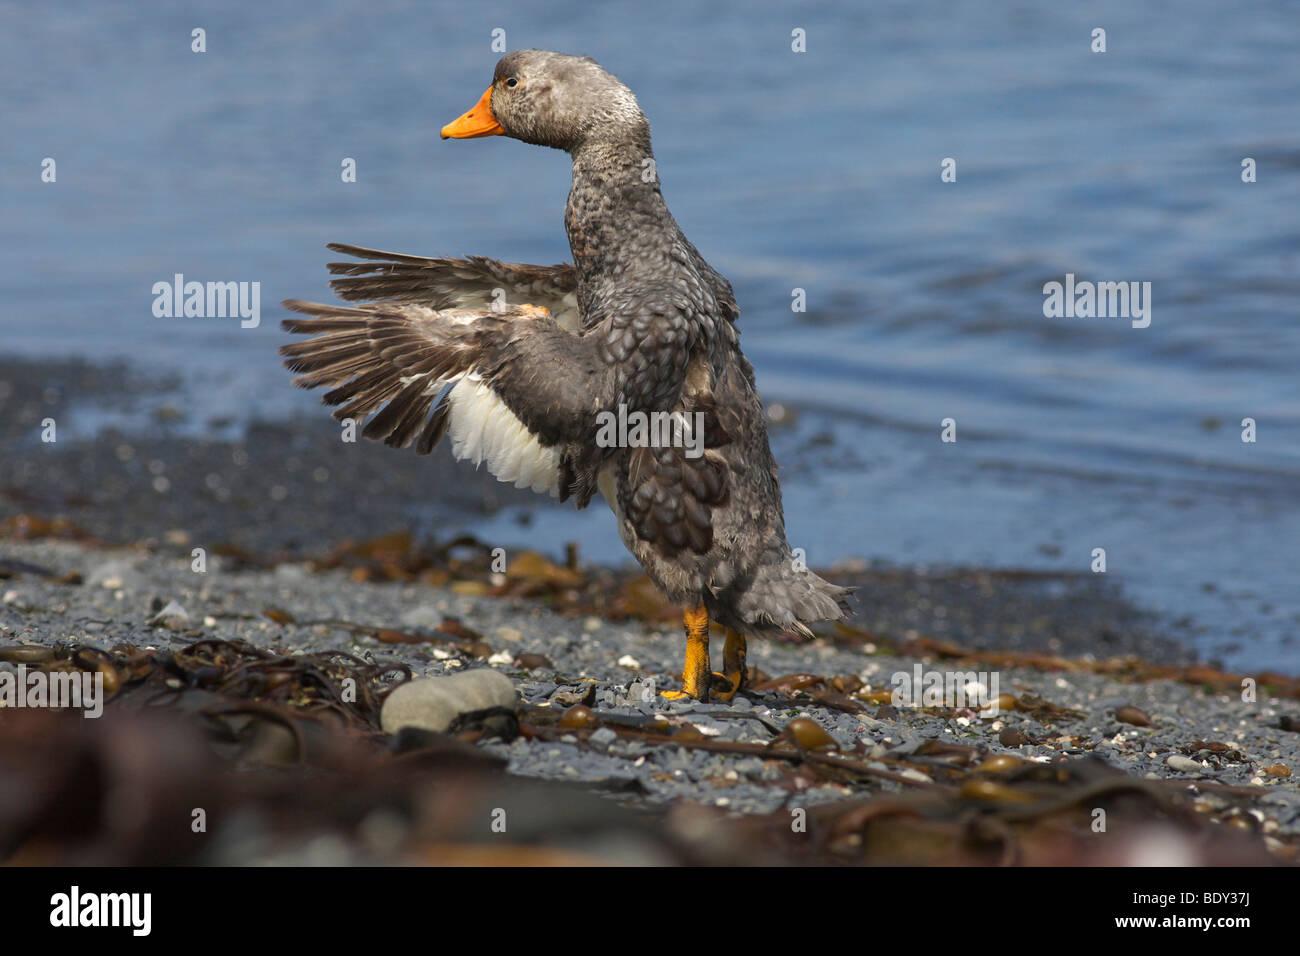 Flightless Falkland Steamer Duck (Tachyeres brachypterus), Falkland Islands, South America - Stock Image